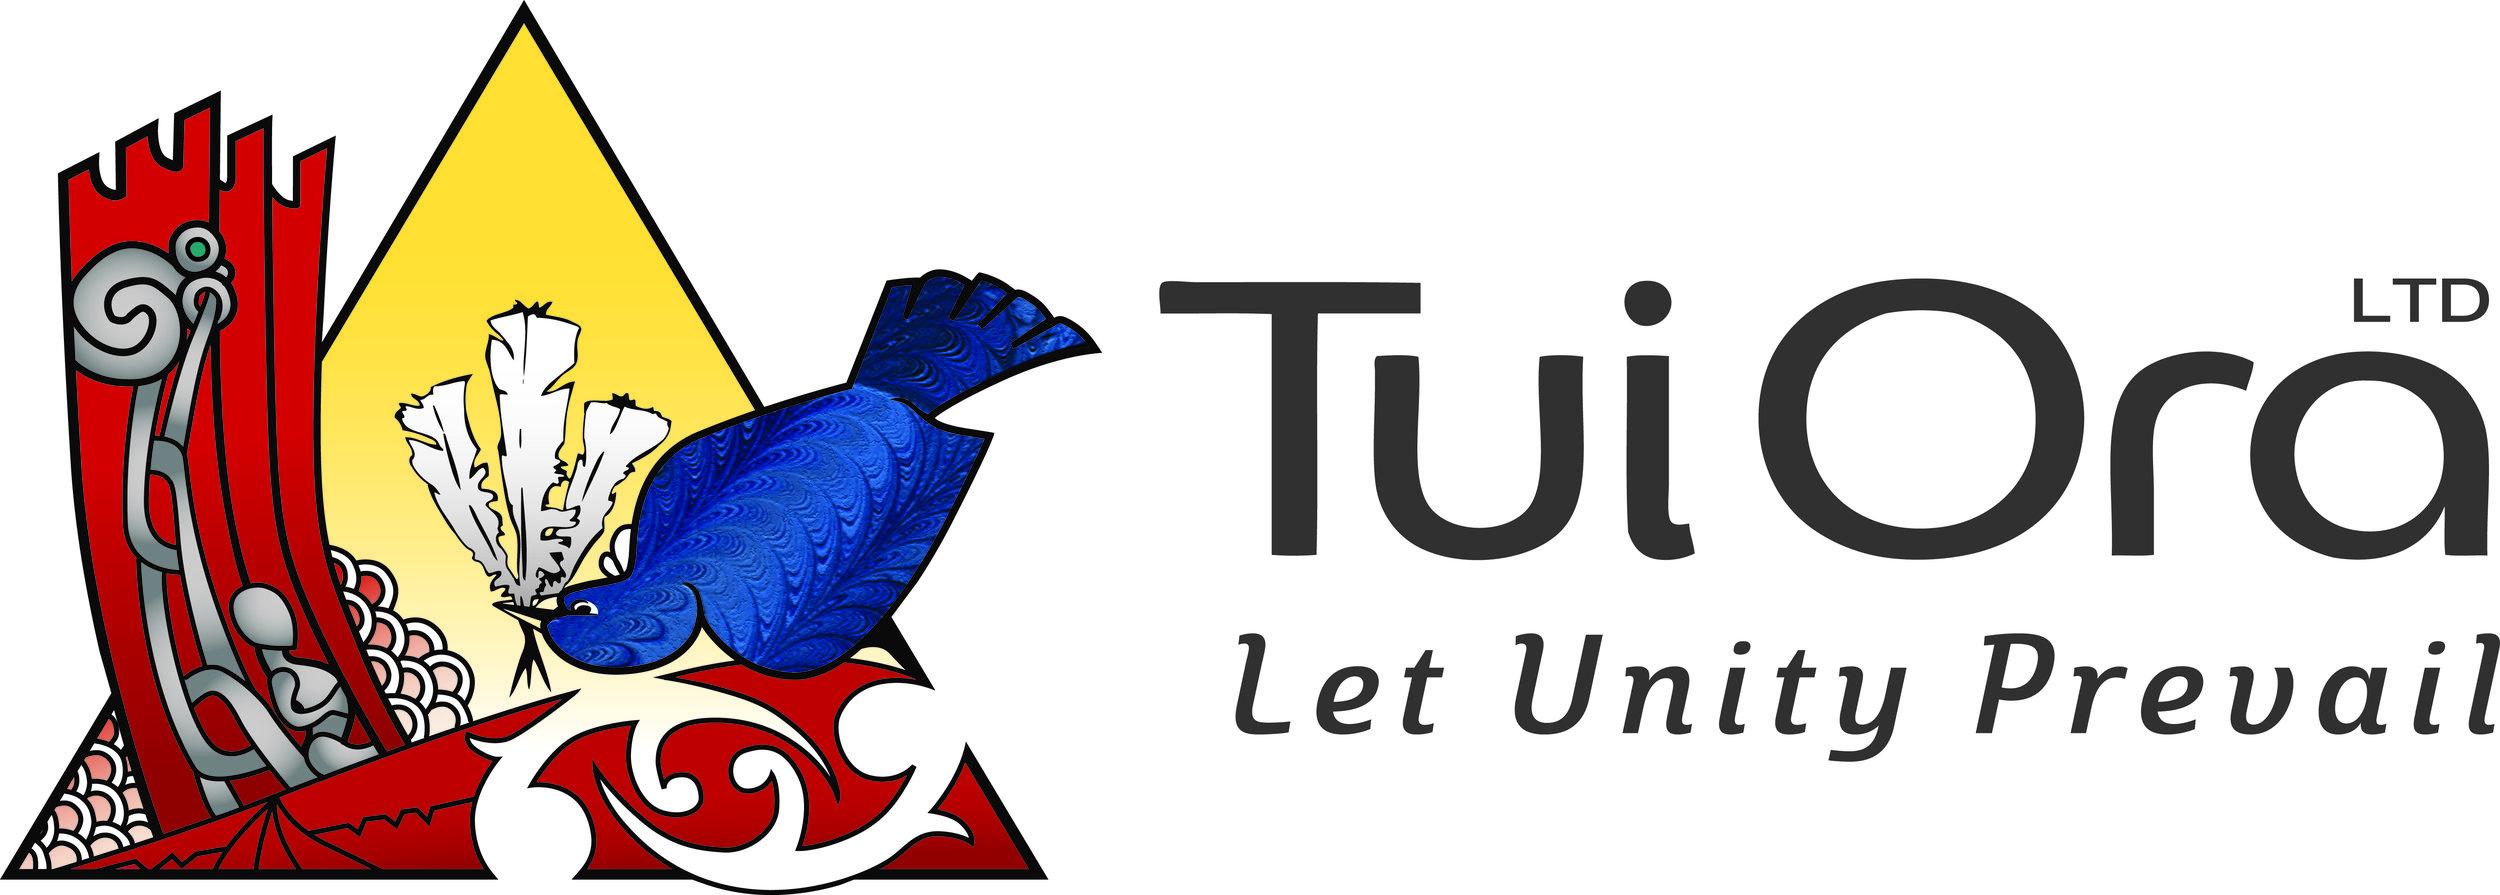 Tui Ora Logo_OFFICIAL_large (002).jpg